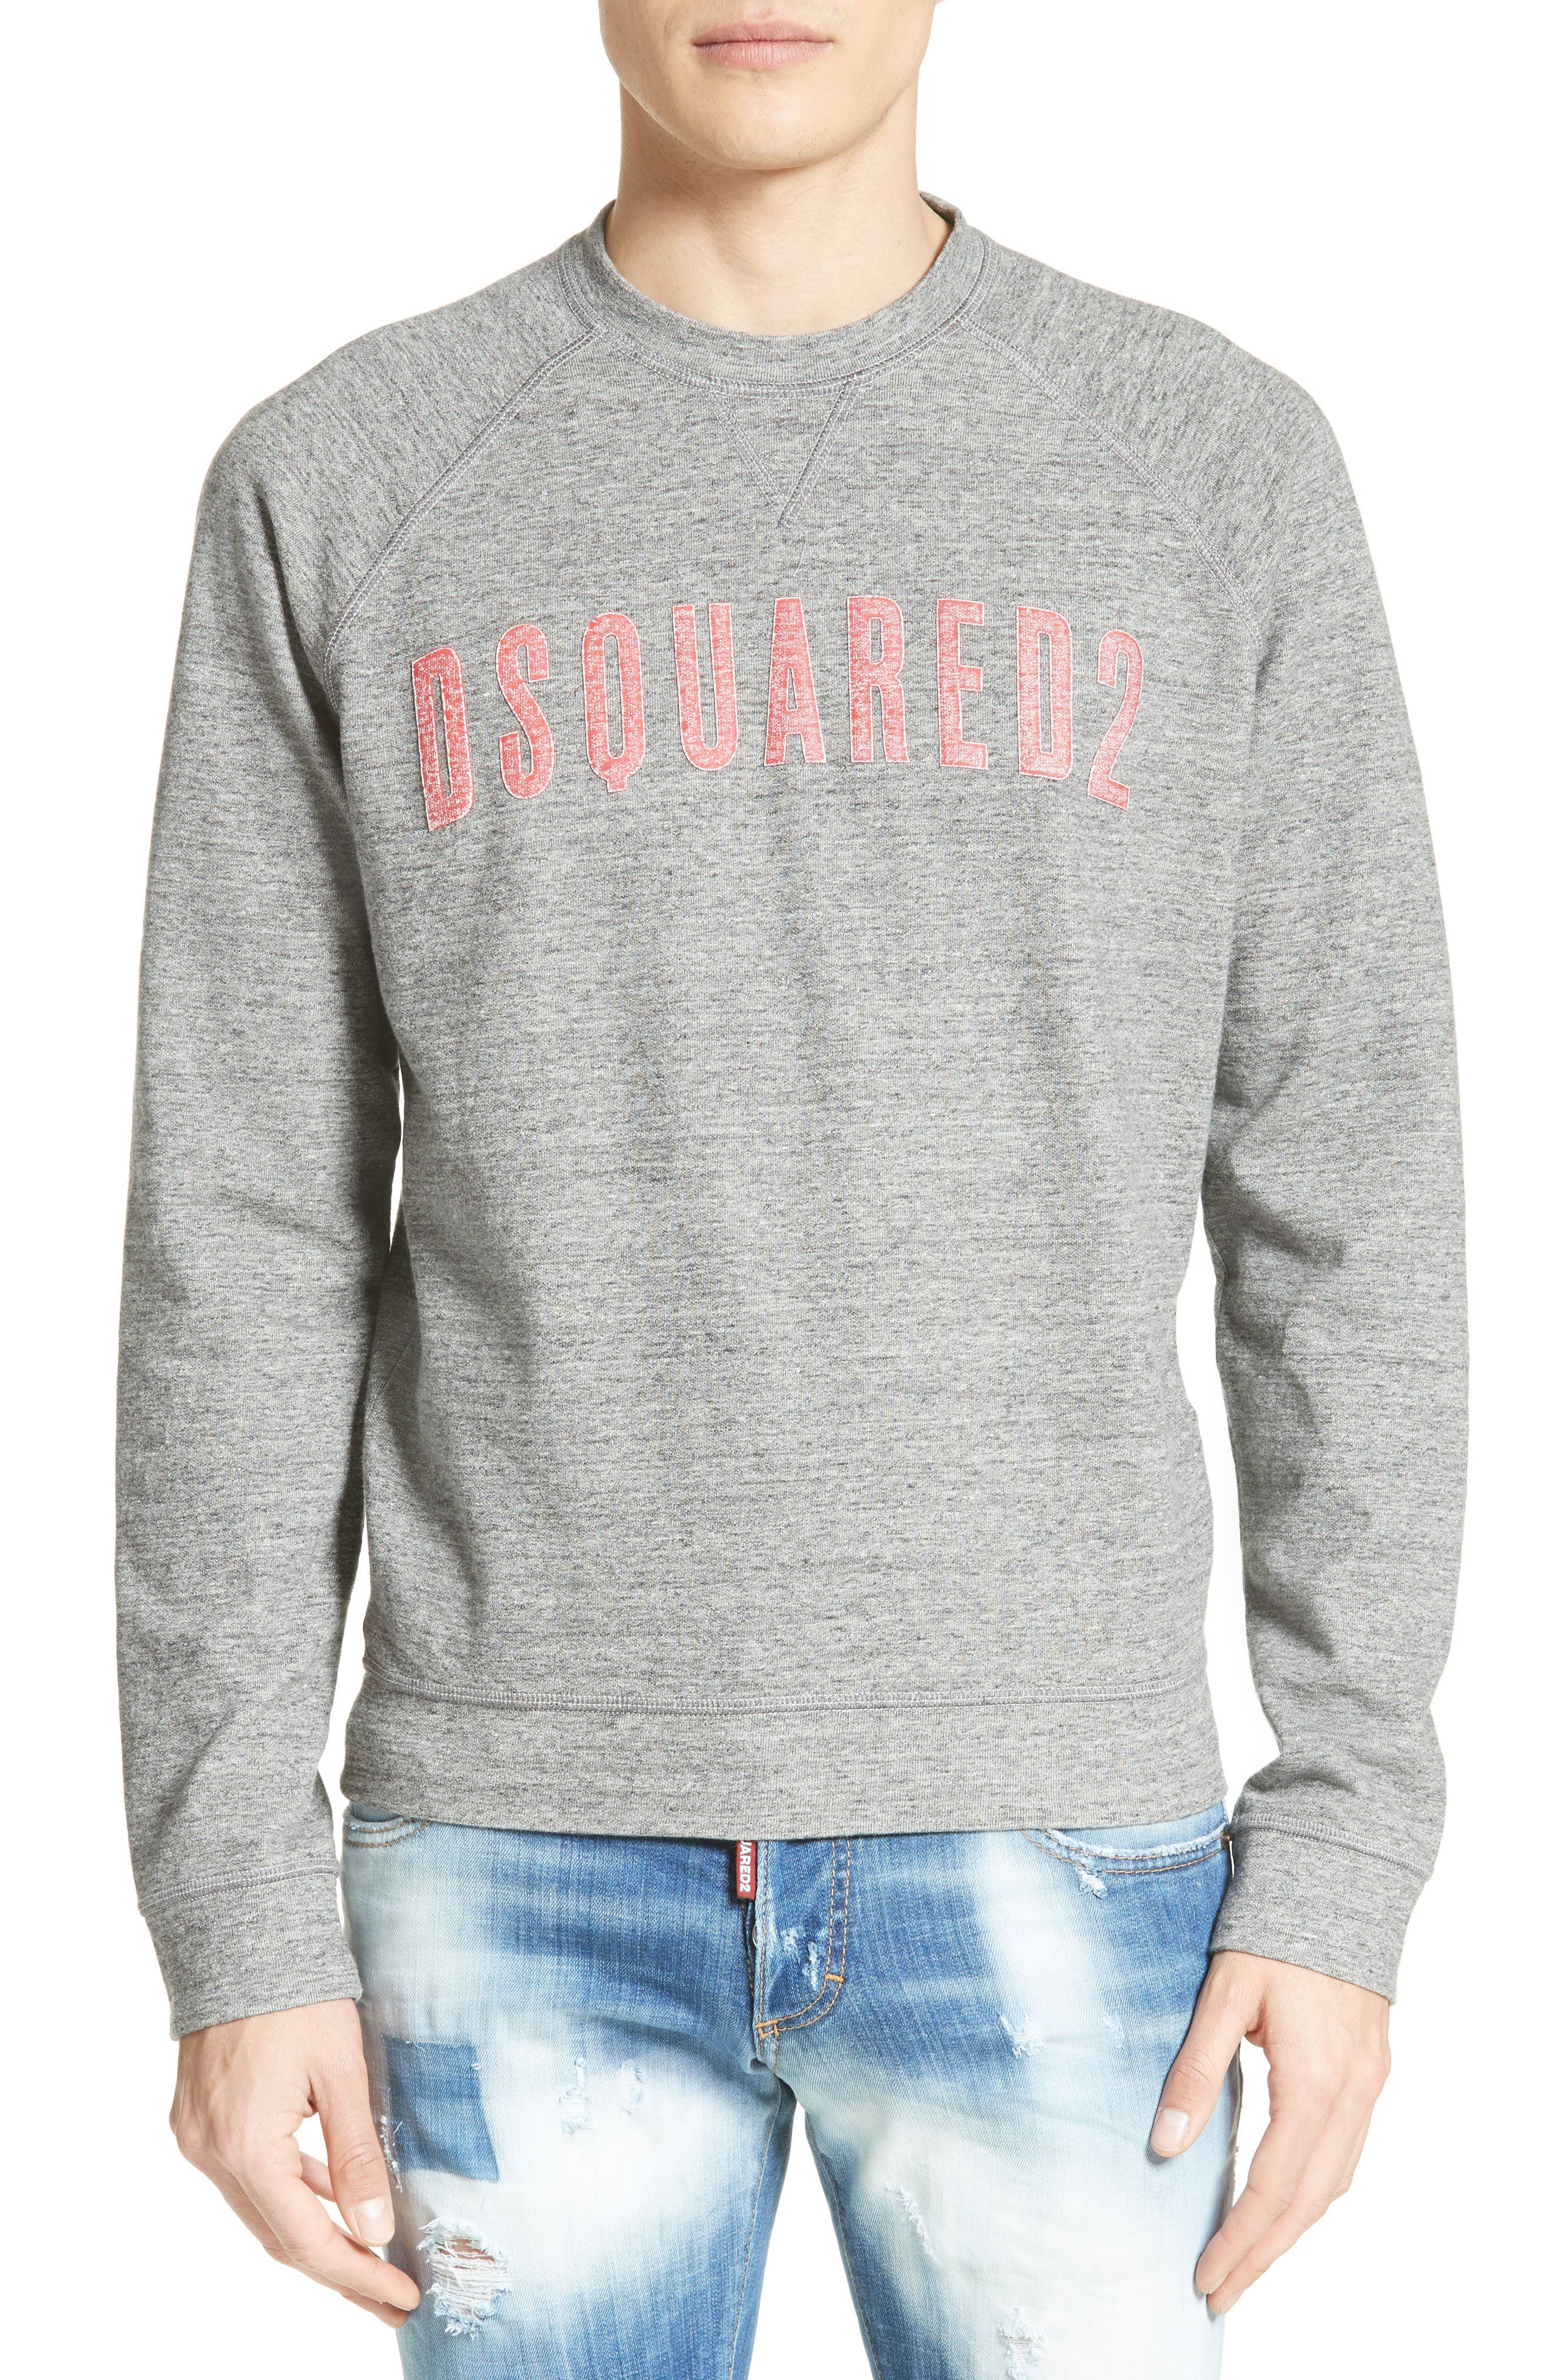 Alternate Image 1 Selected - Dsquared2 Logo Graphic Sweatshirt